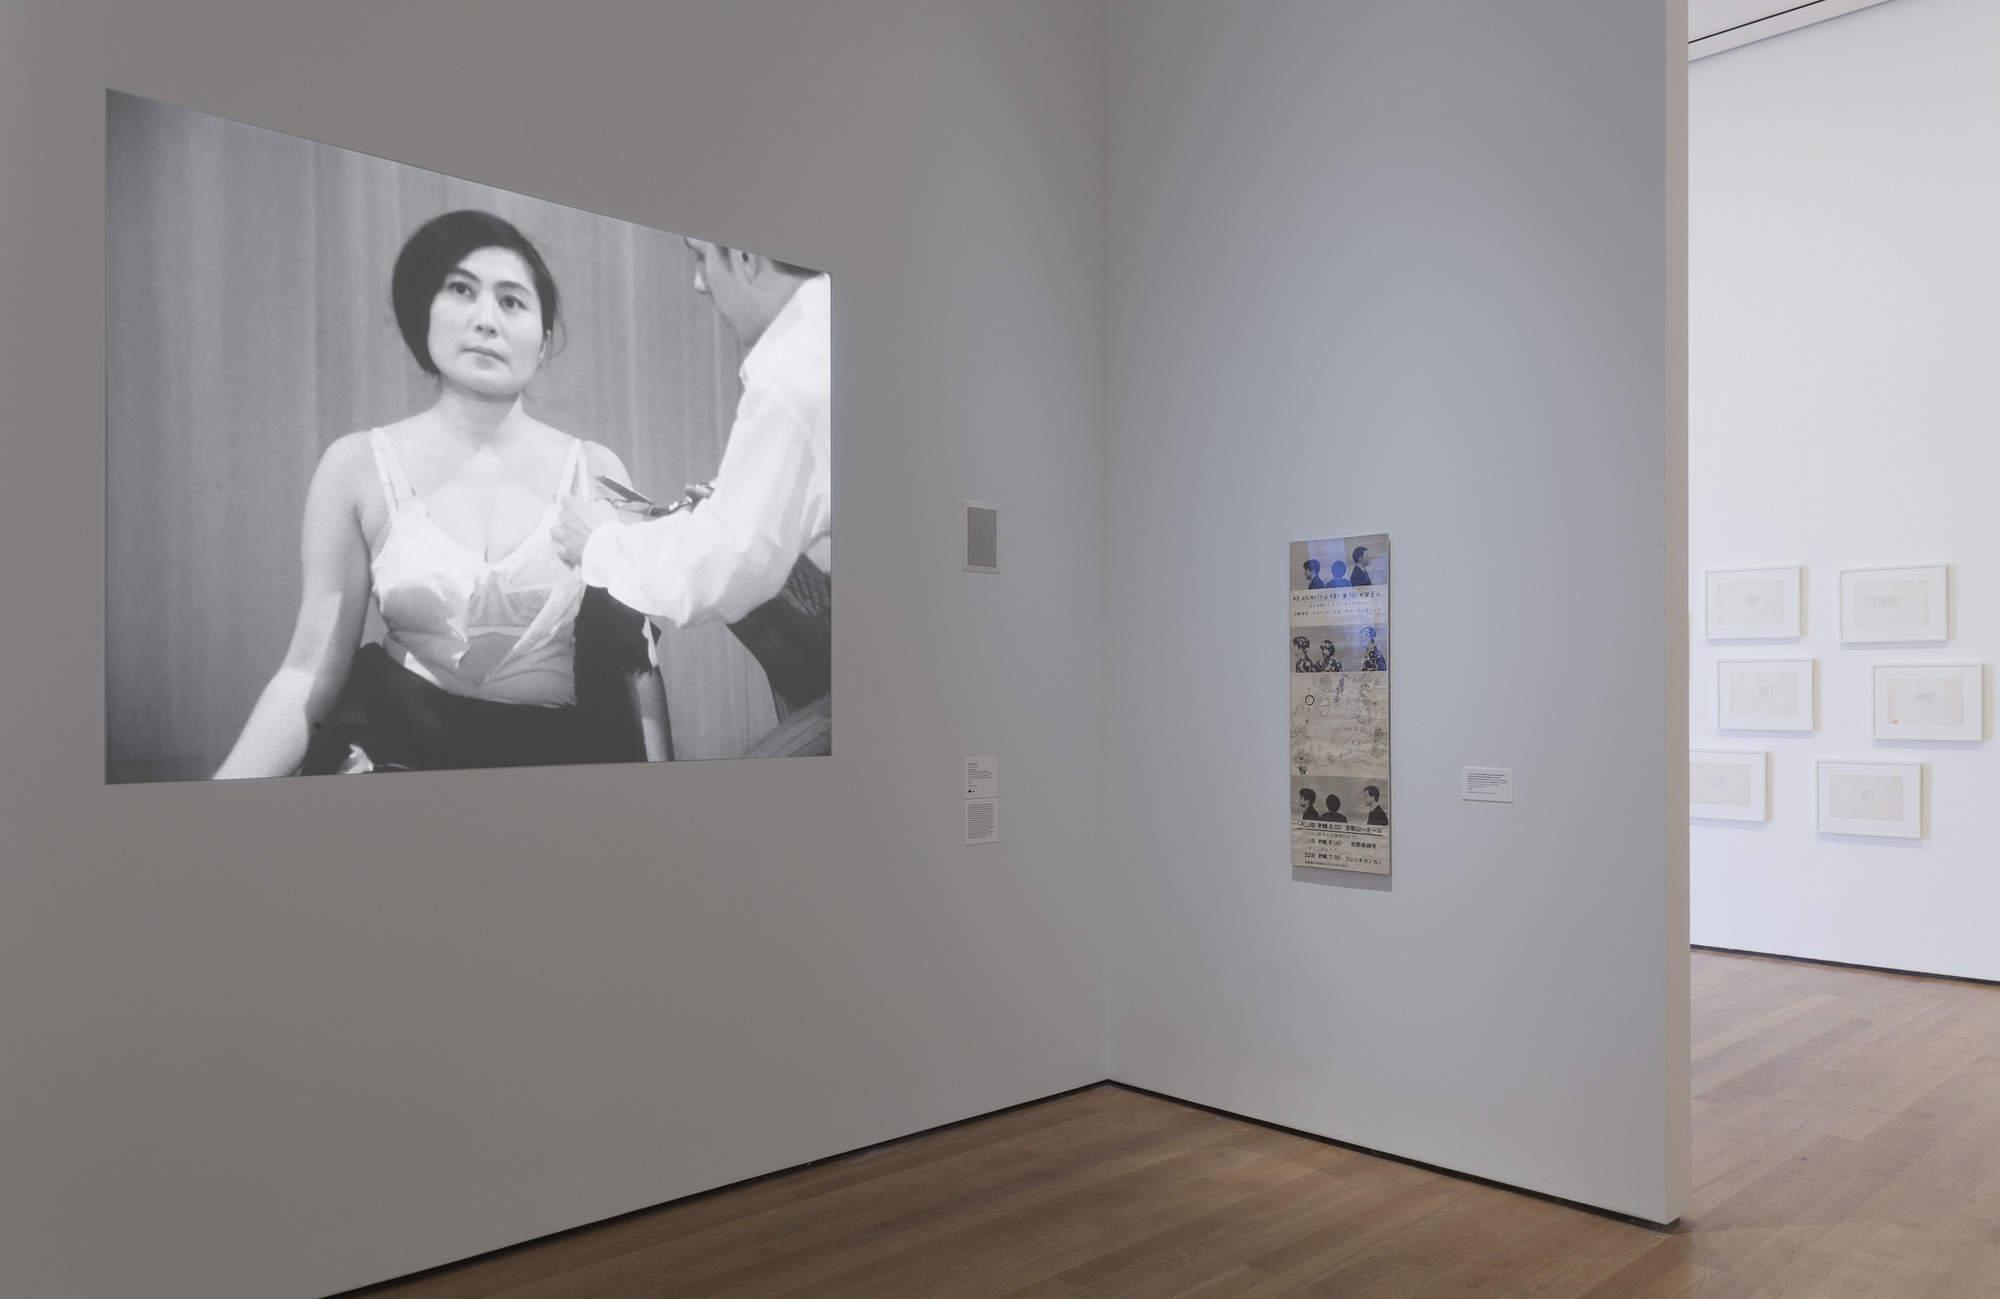 oc-moma-exhibition-archive-2